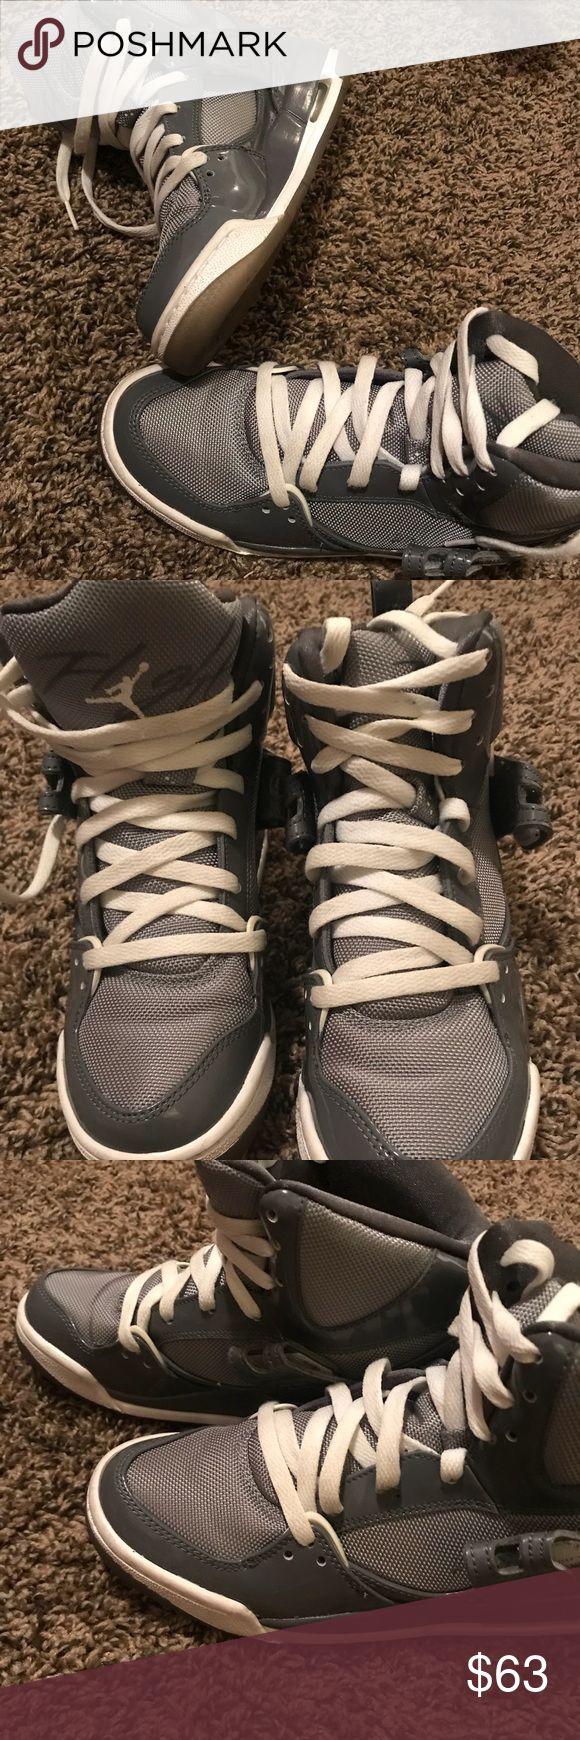 Jordan's Slightly worn grey & white Jordan's purchased from Champs Sports in 2011 Jordan Shoes Sneakers